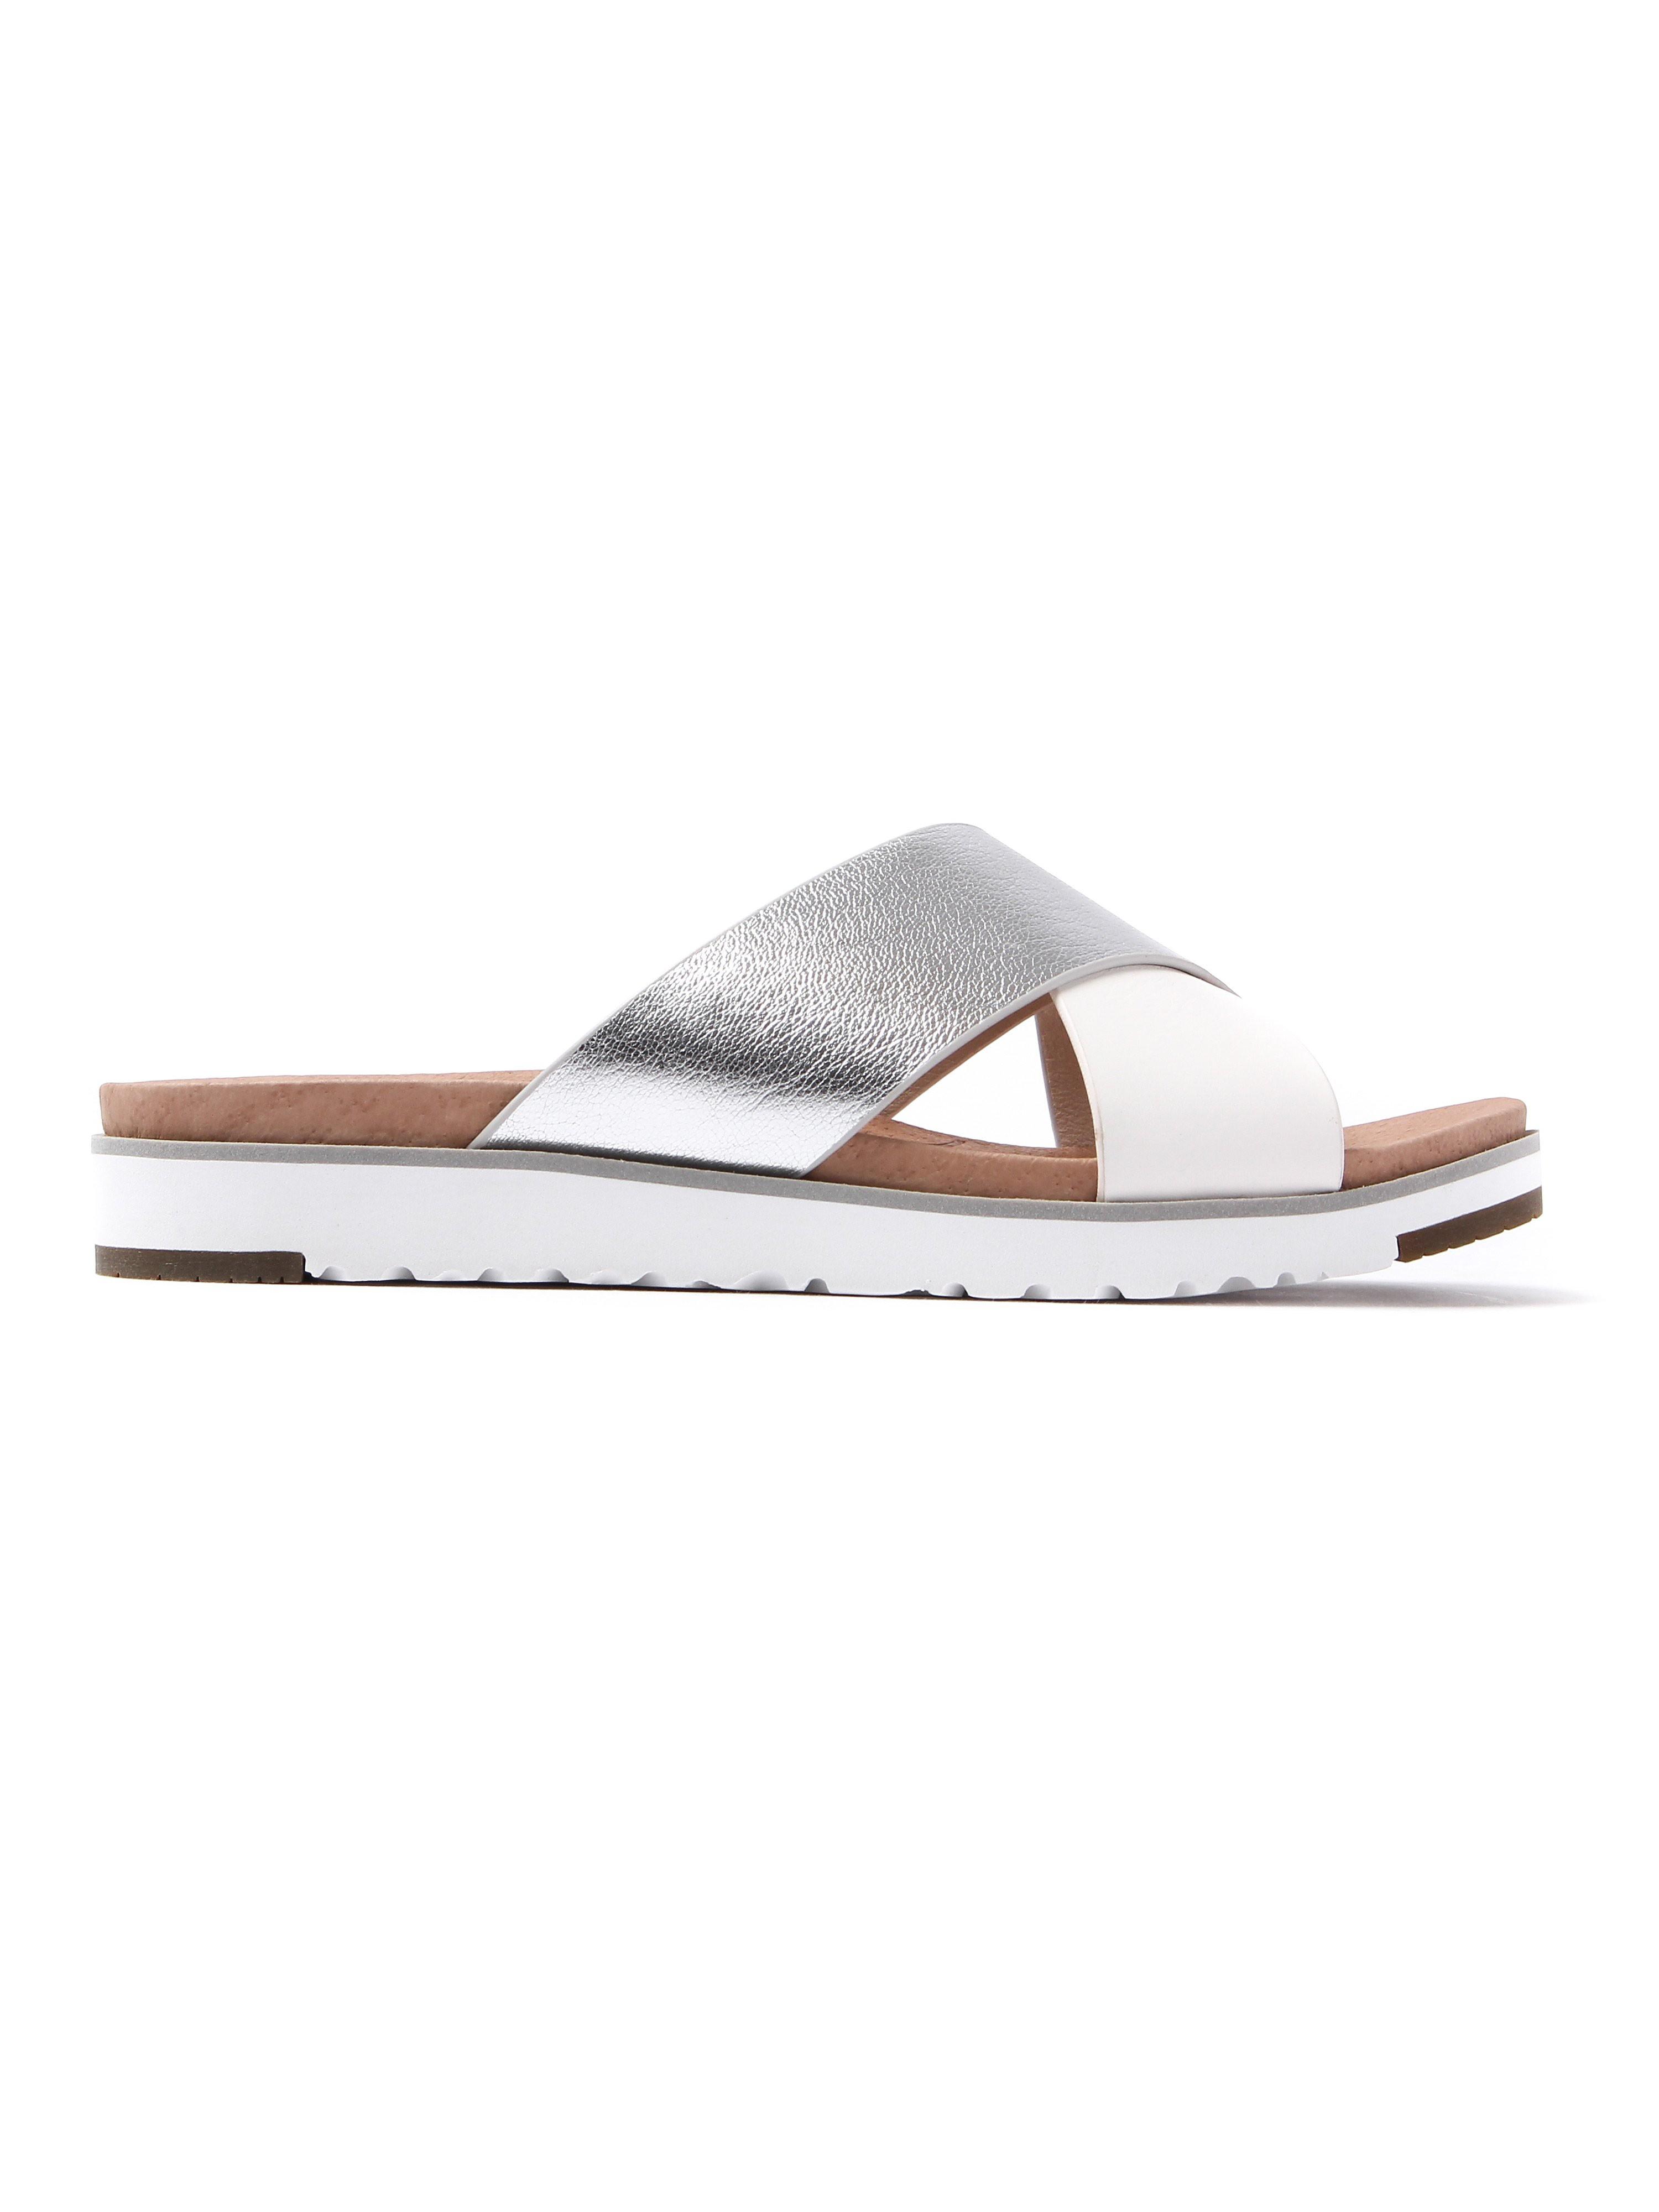 Ugg Women's Kari Metallic Leather Slide Sandals - Silver & White